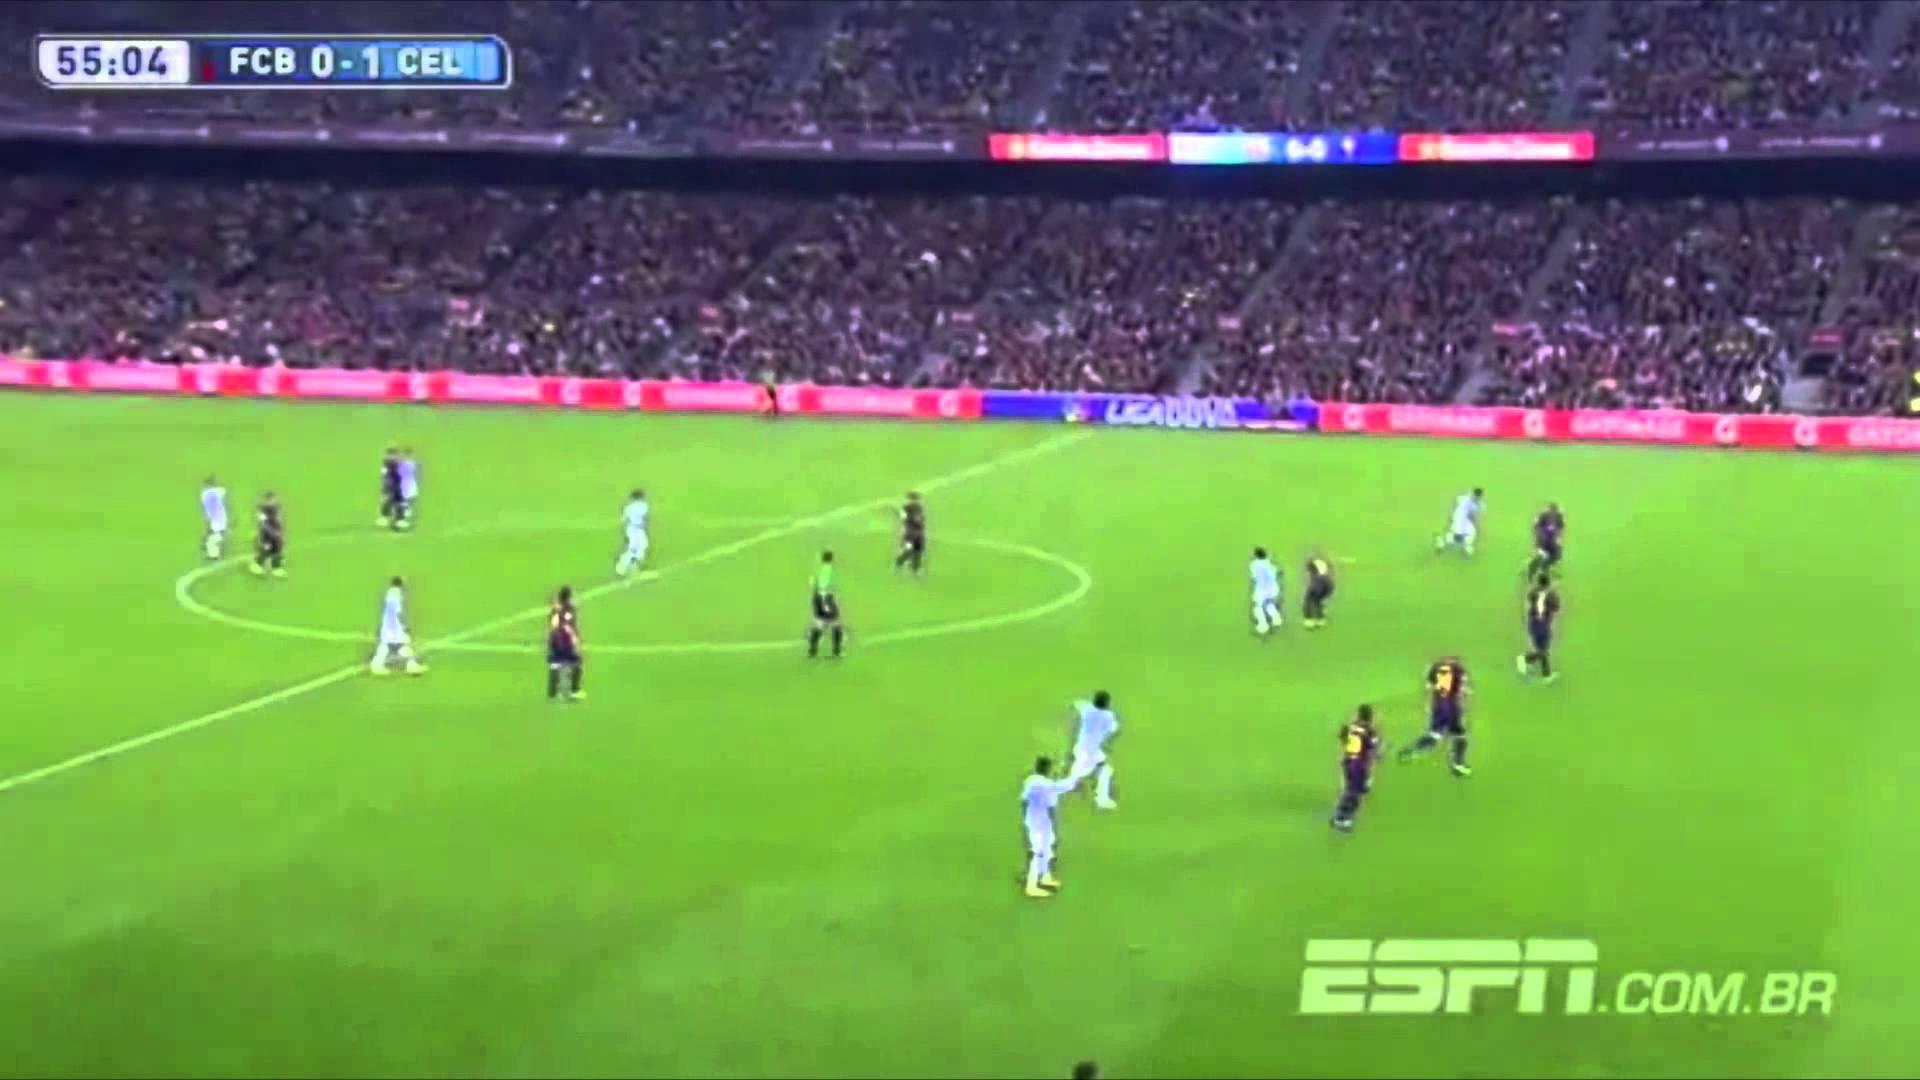 SKRÓT: Celta – Barca